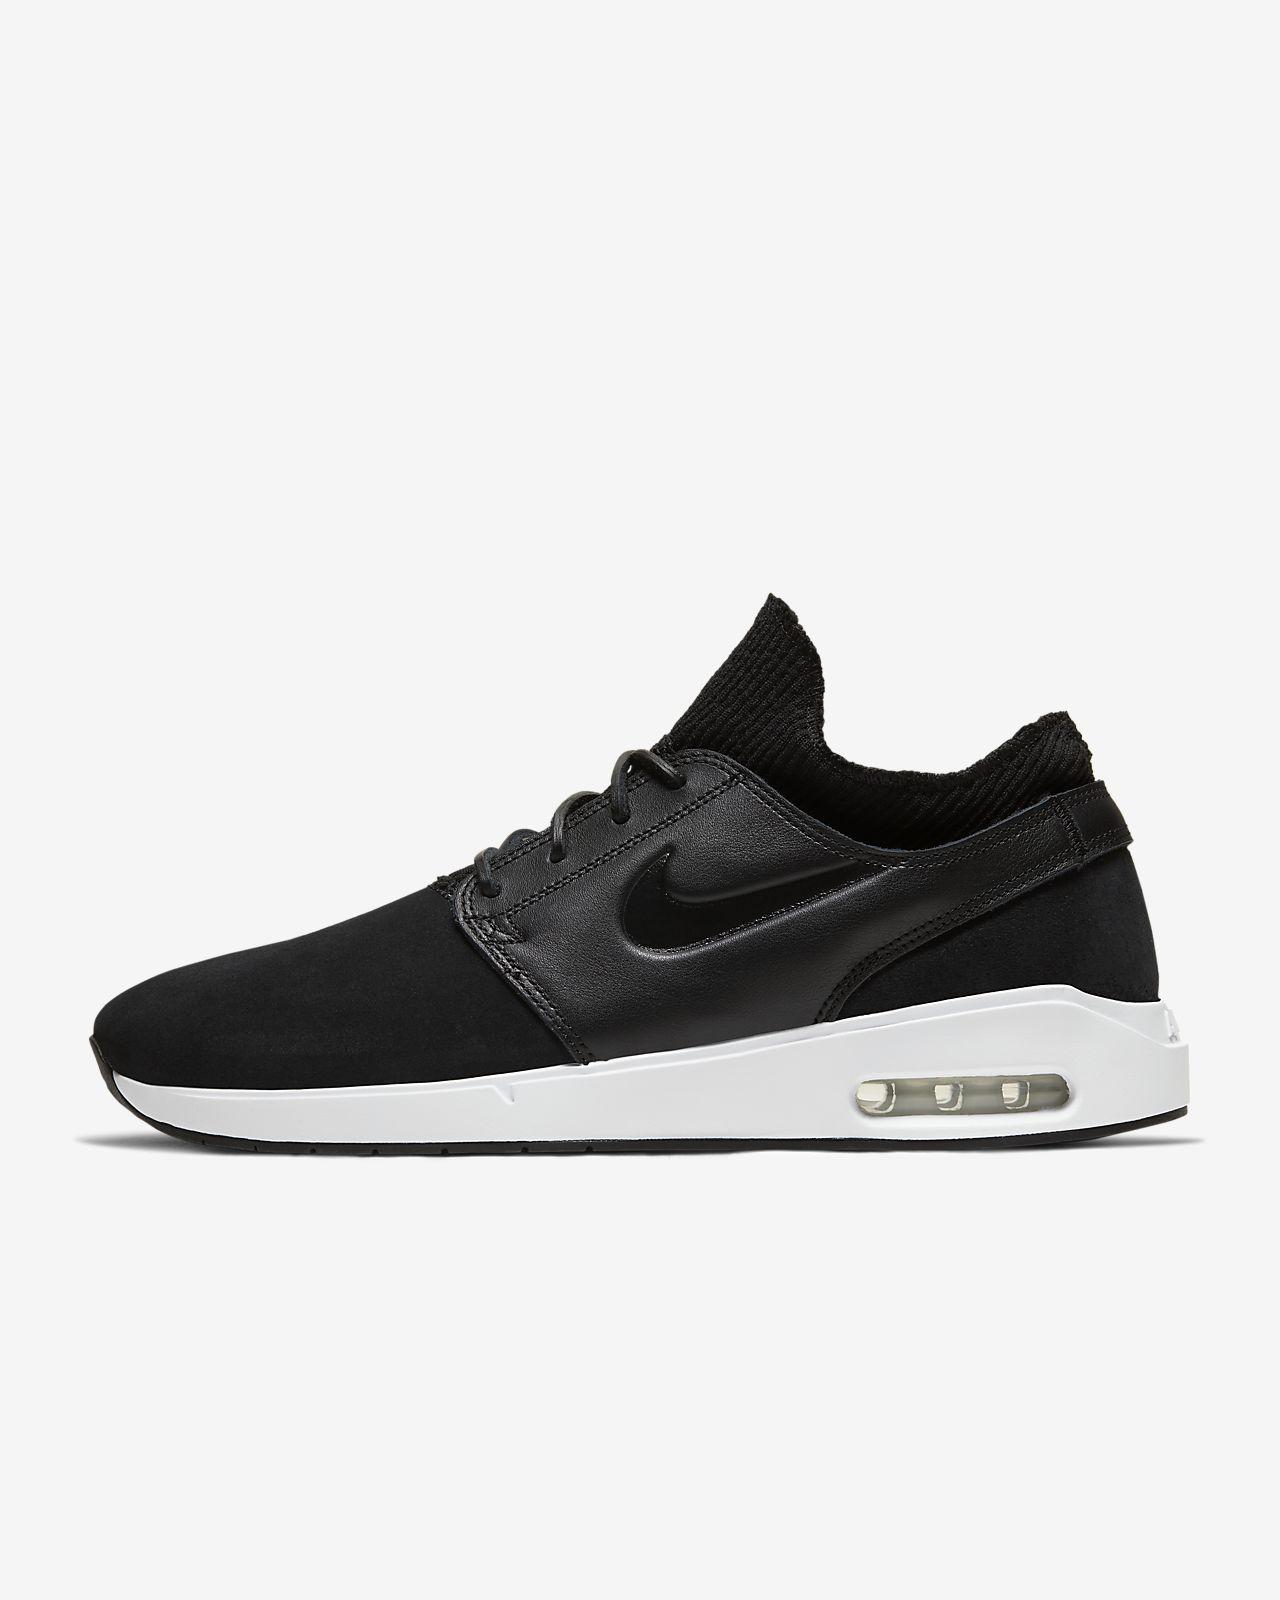 Nike SB Air Max Stefan Janoski 2 Premium Zapatillas de skateboard